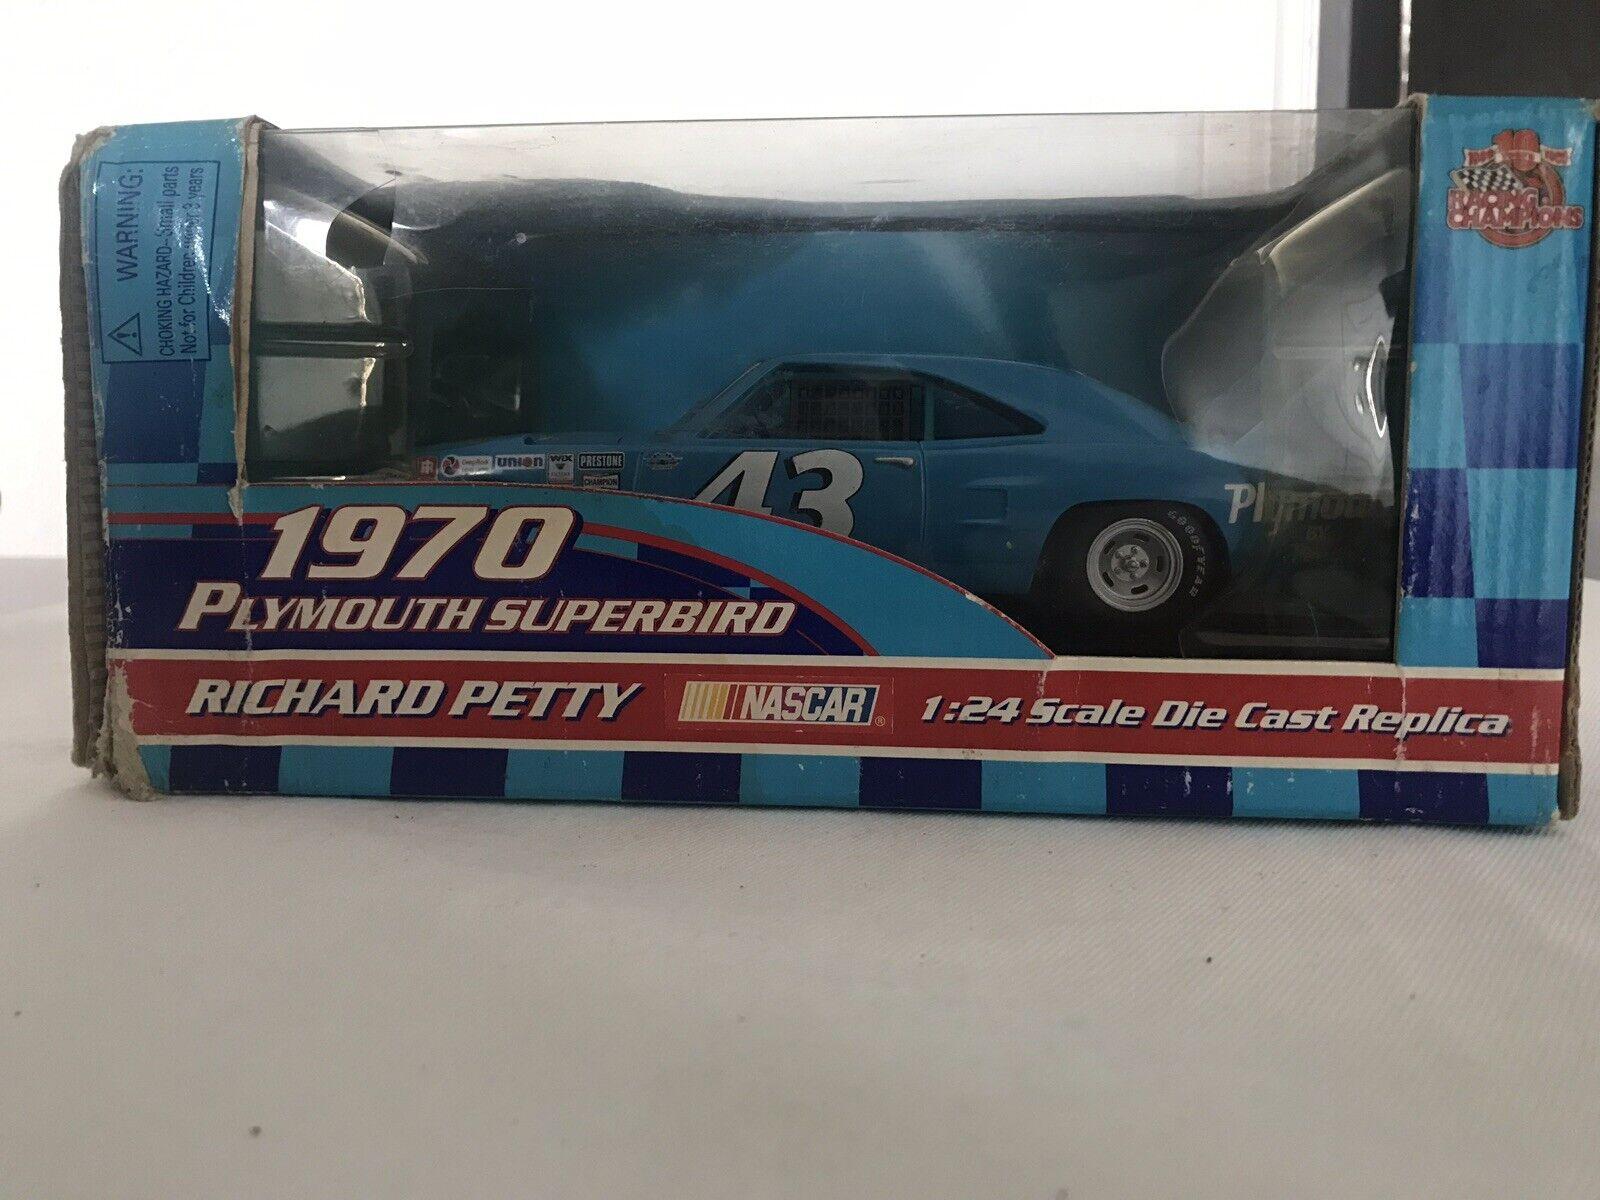 1970 Plymouth superbird  1:24 scale Diecast replica Richard petty